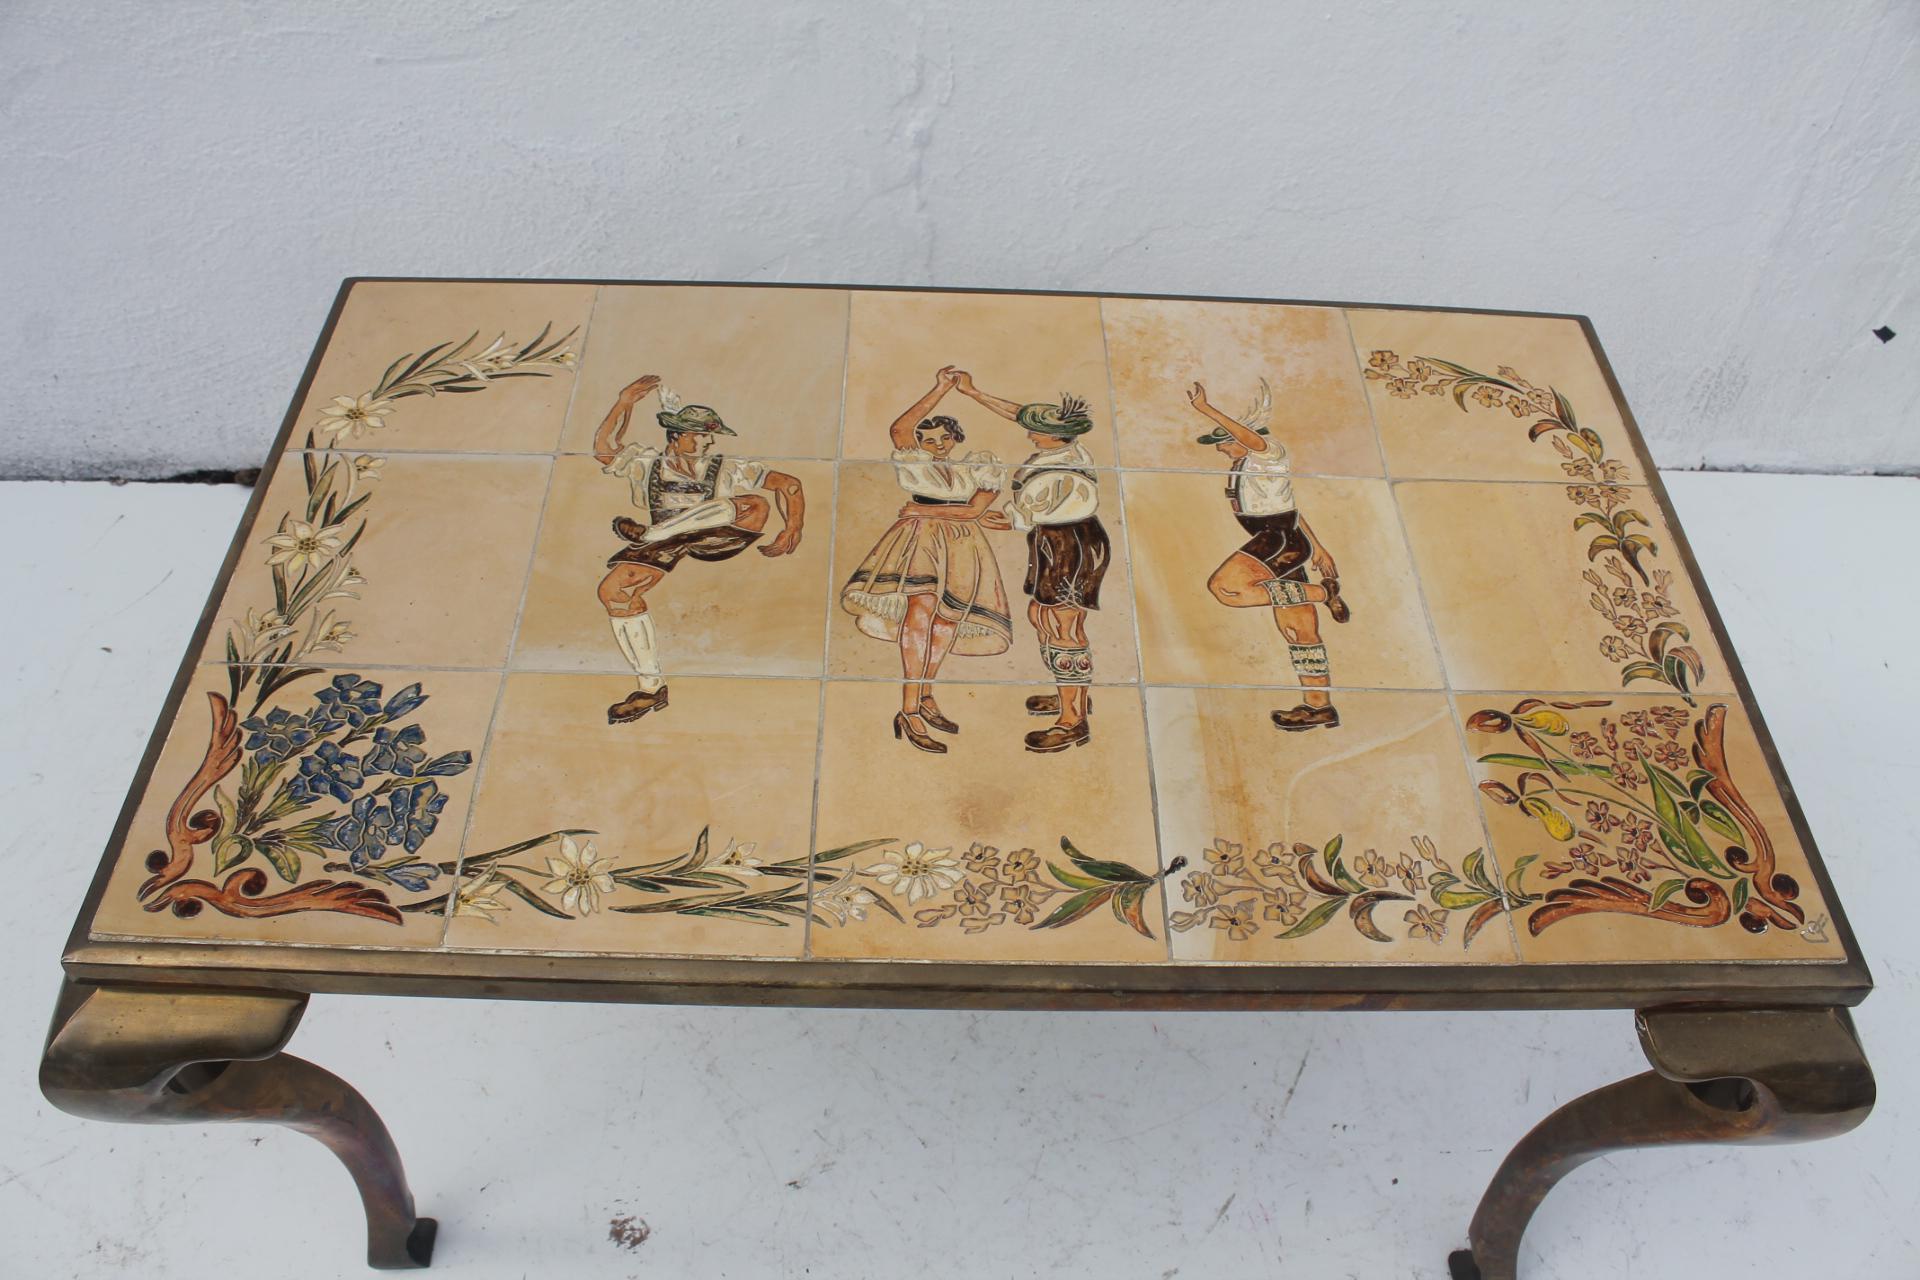 Vintage Brass Ceramic Tile Top Coffee Table Chairish Rh Com Set